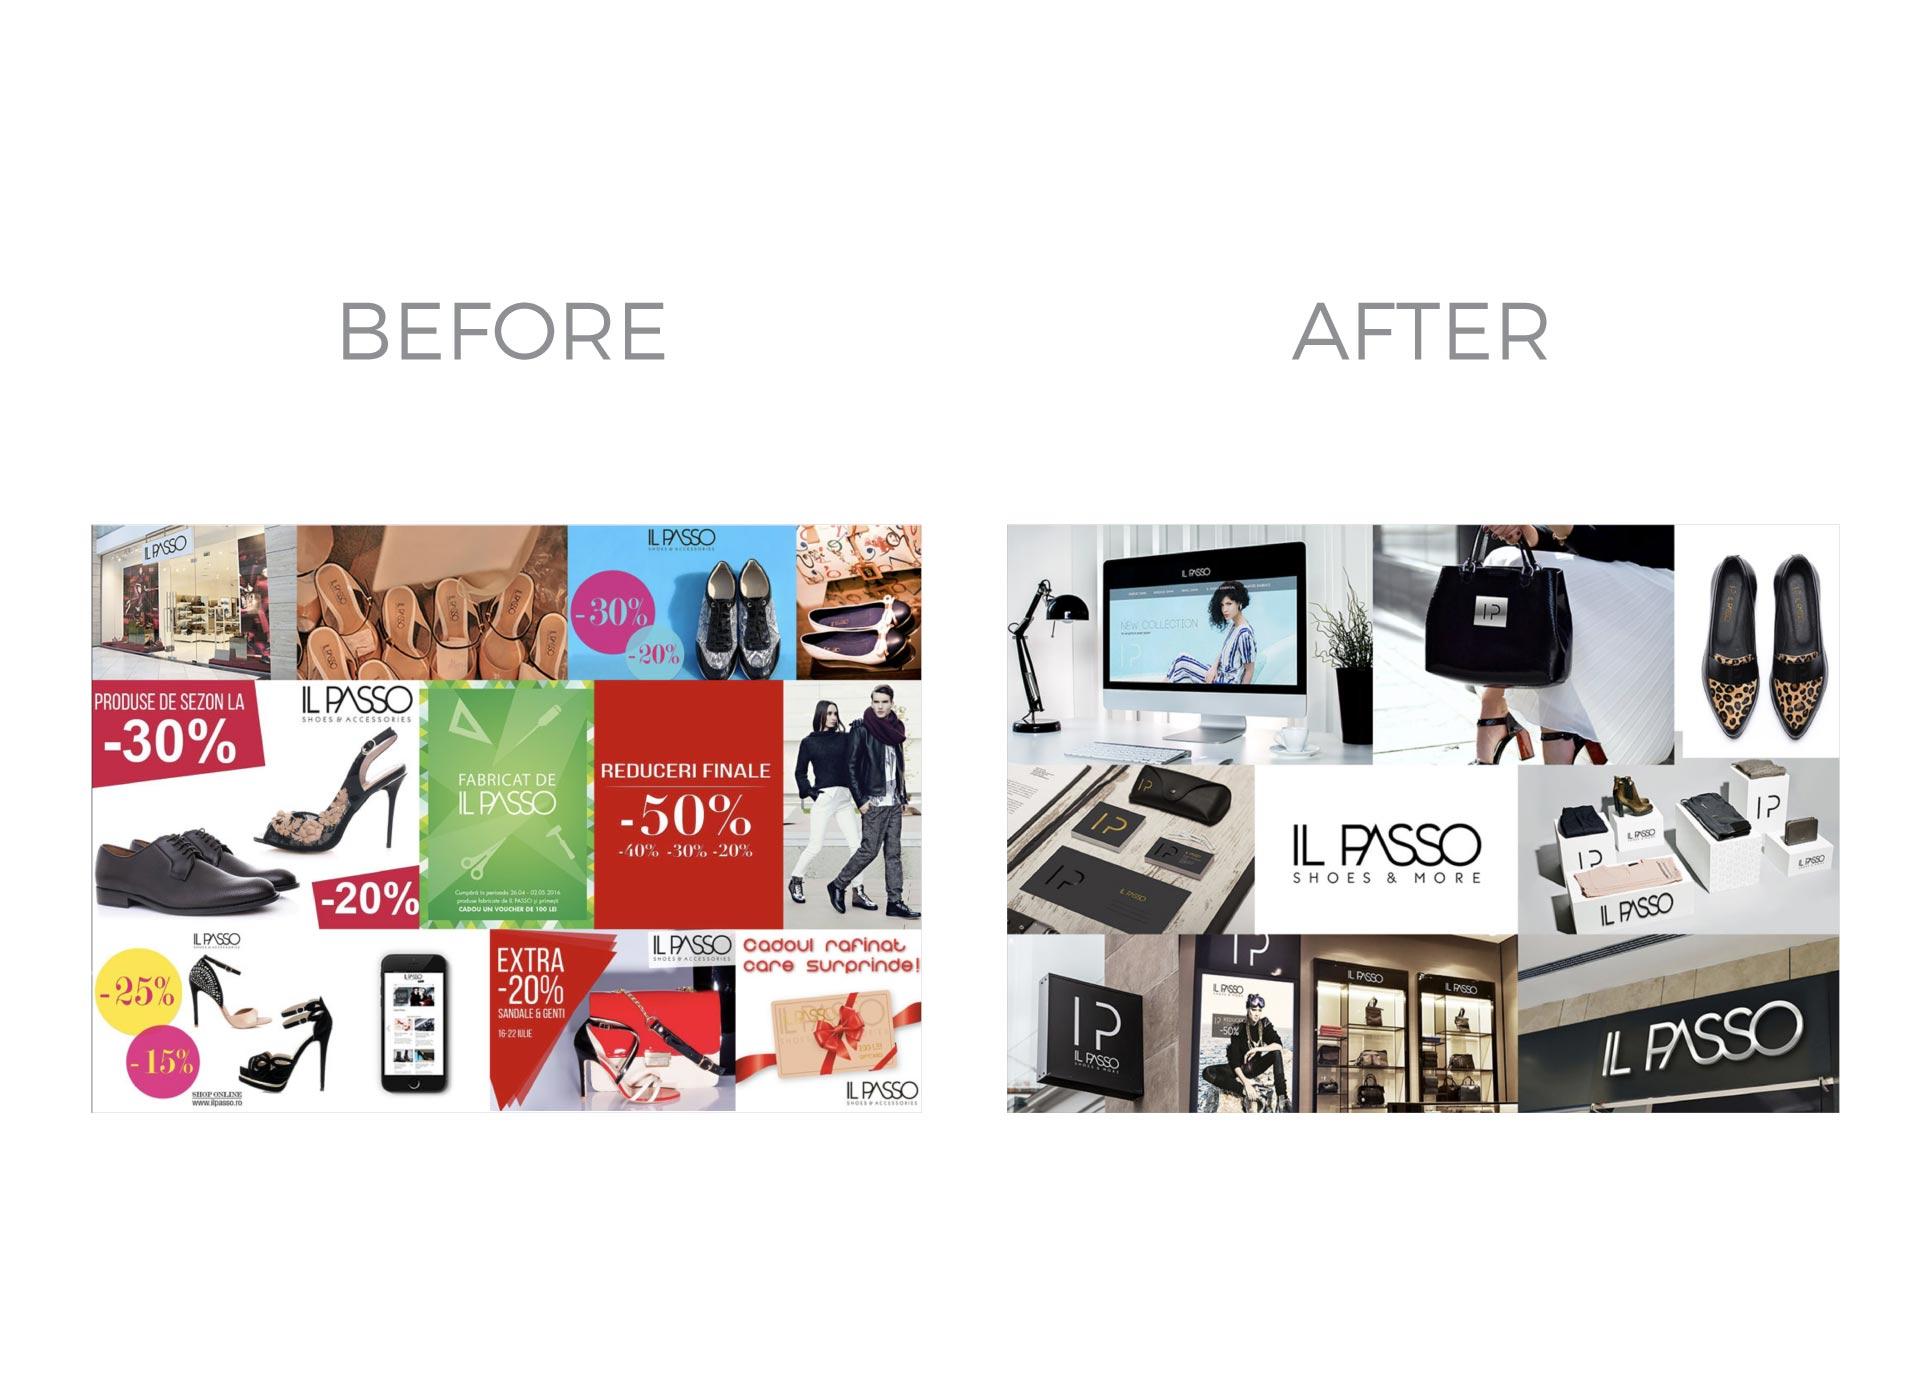 il passo portfolio inoveo before and after rebranding